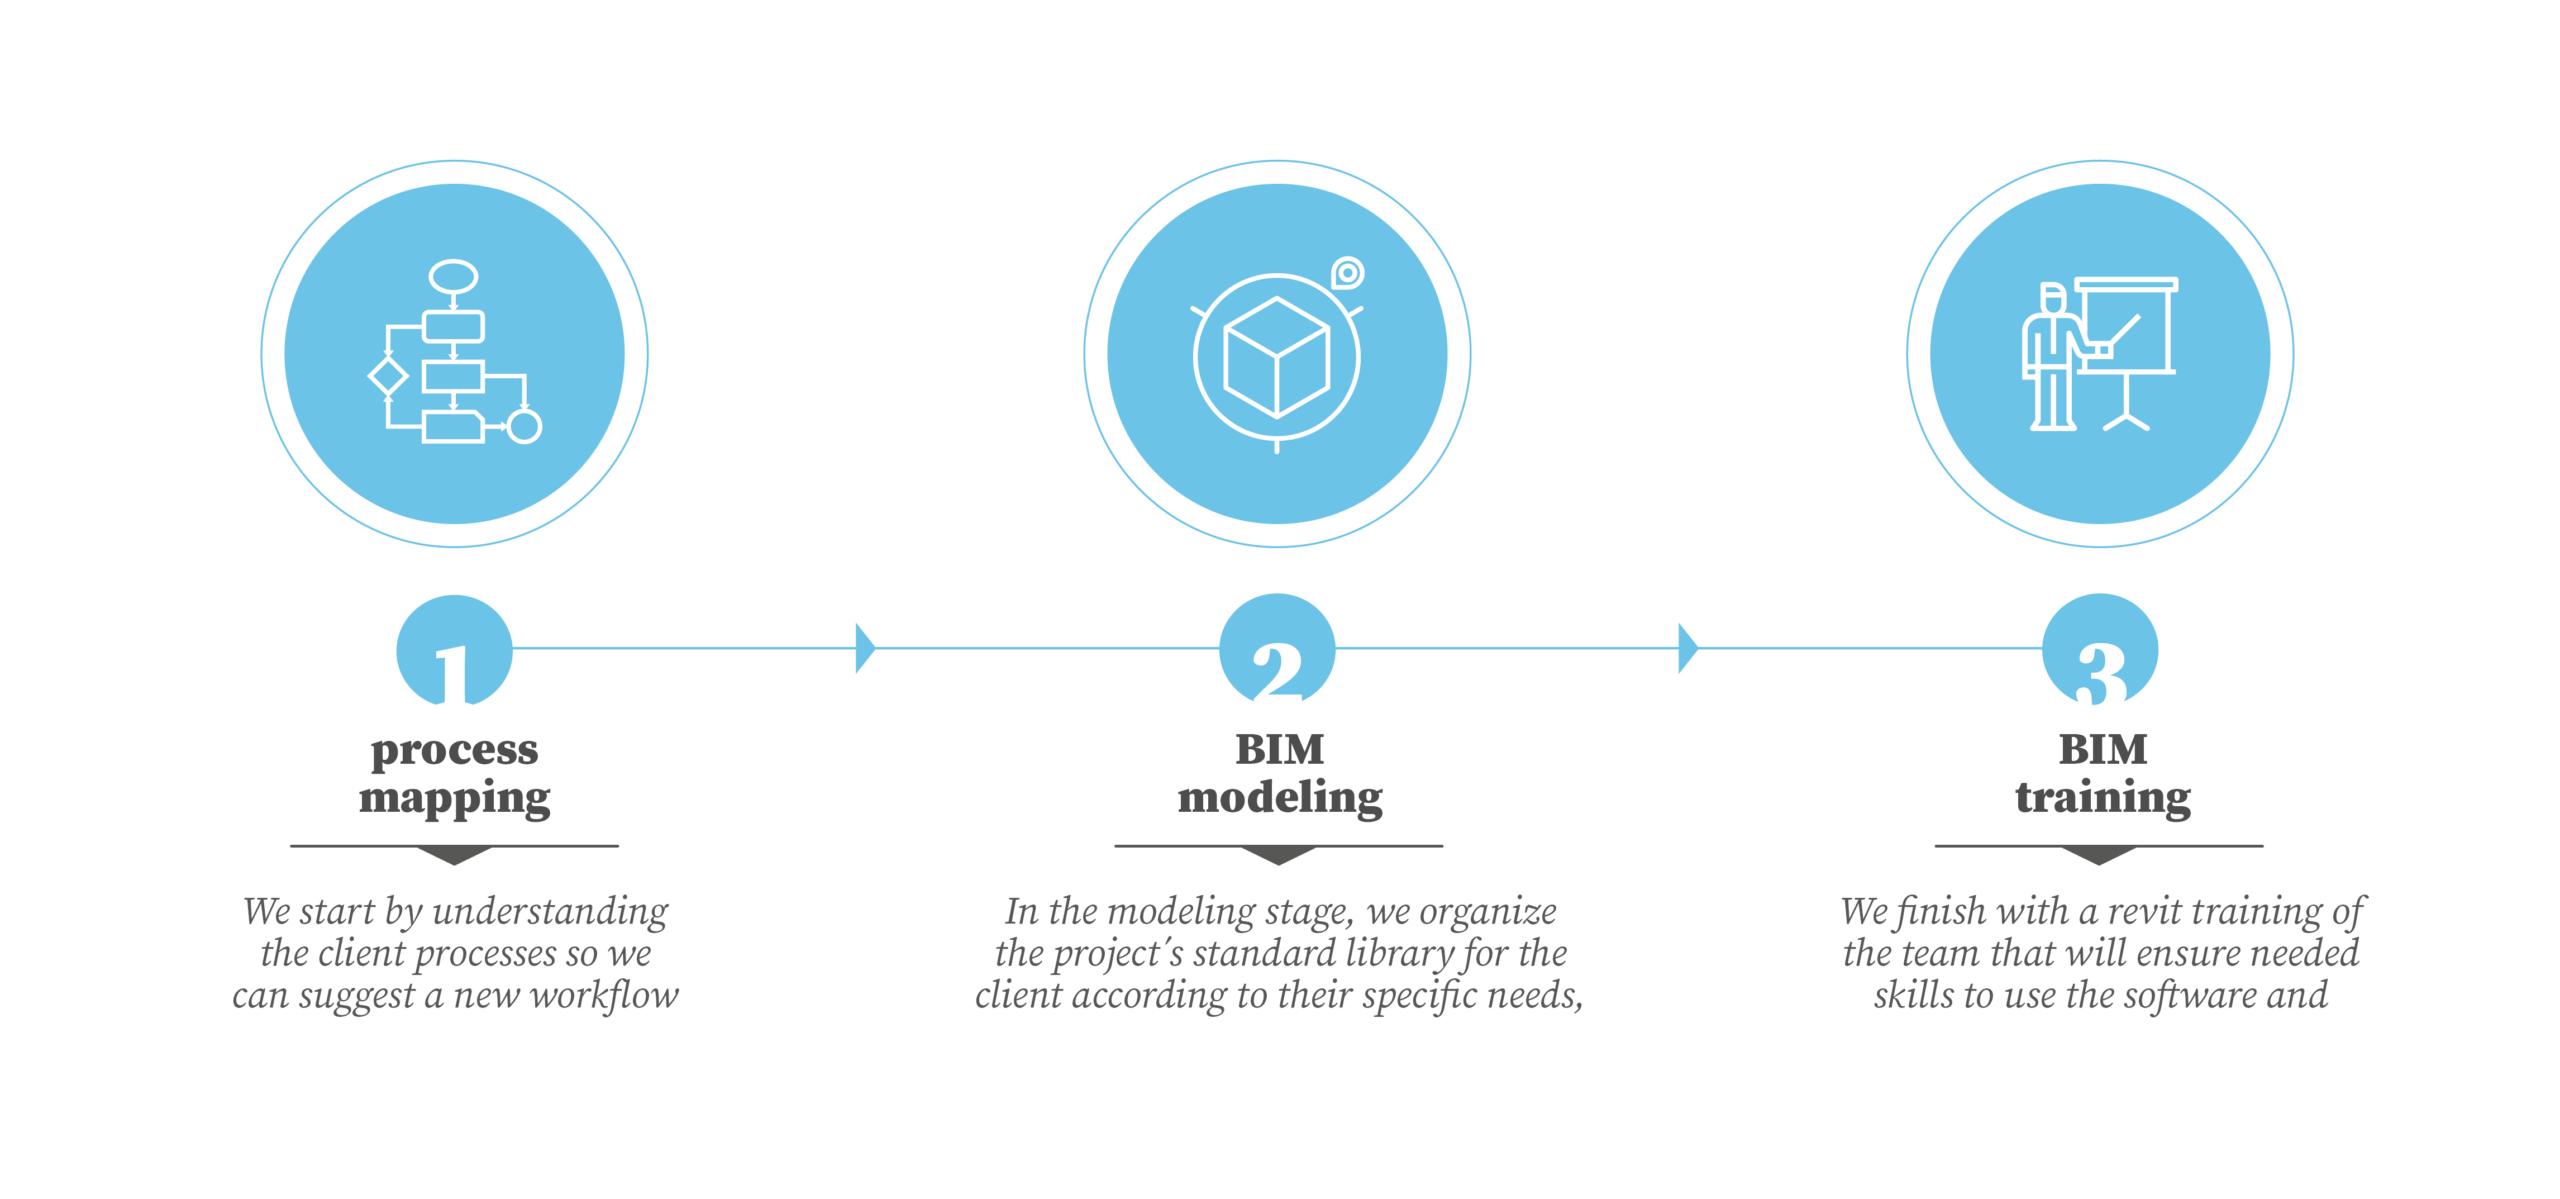 Process mapping, Bim modeling and BIM training